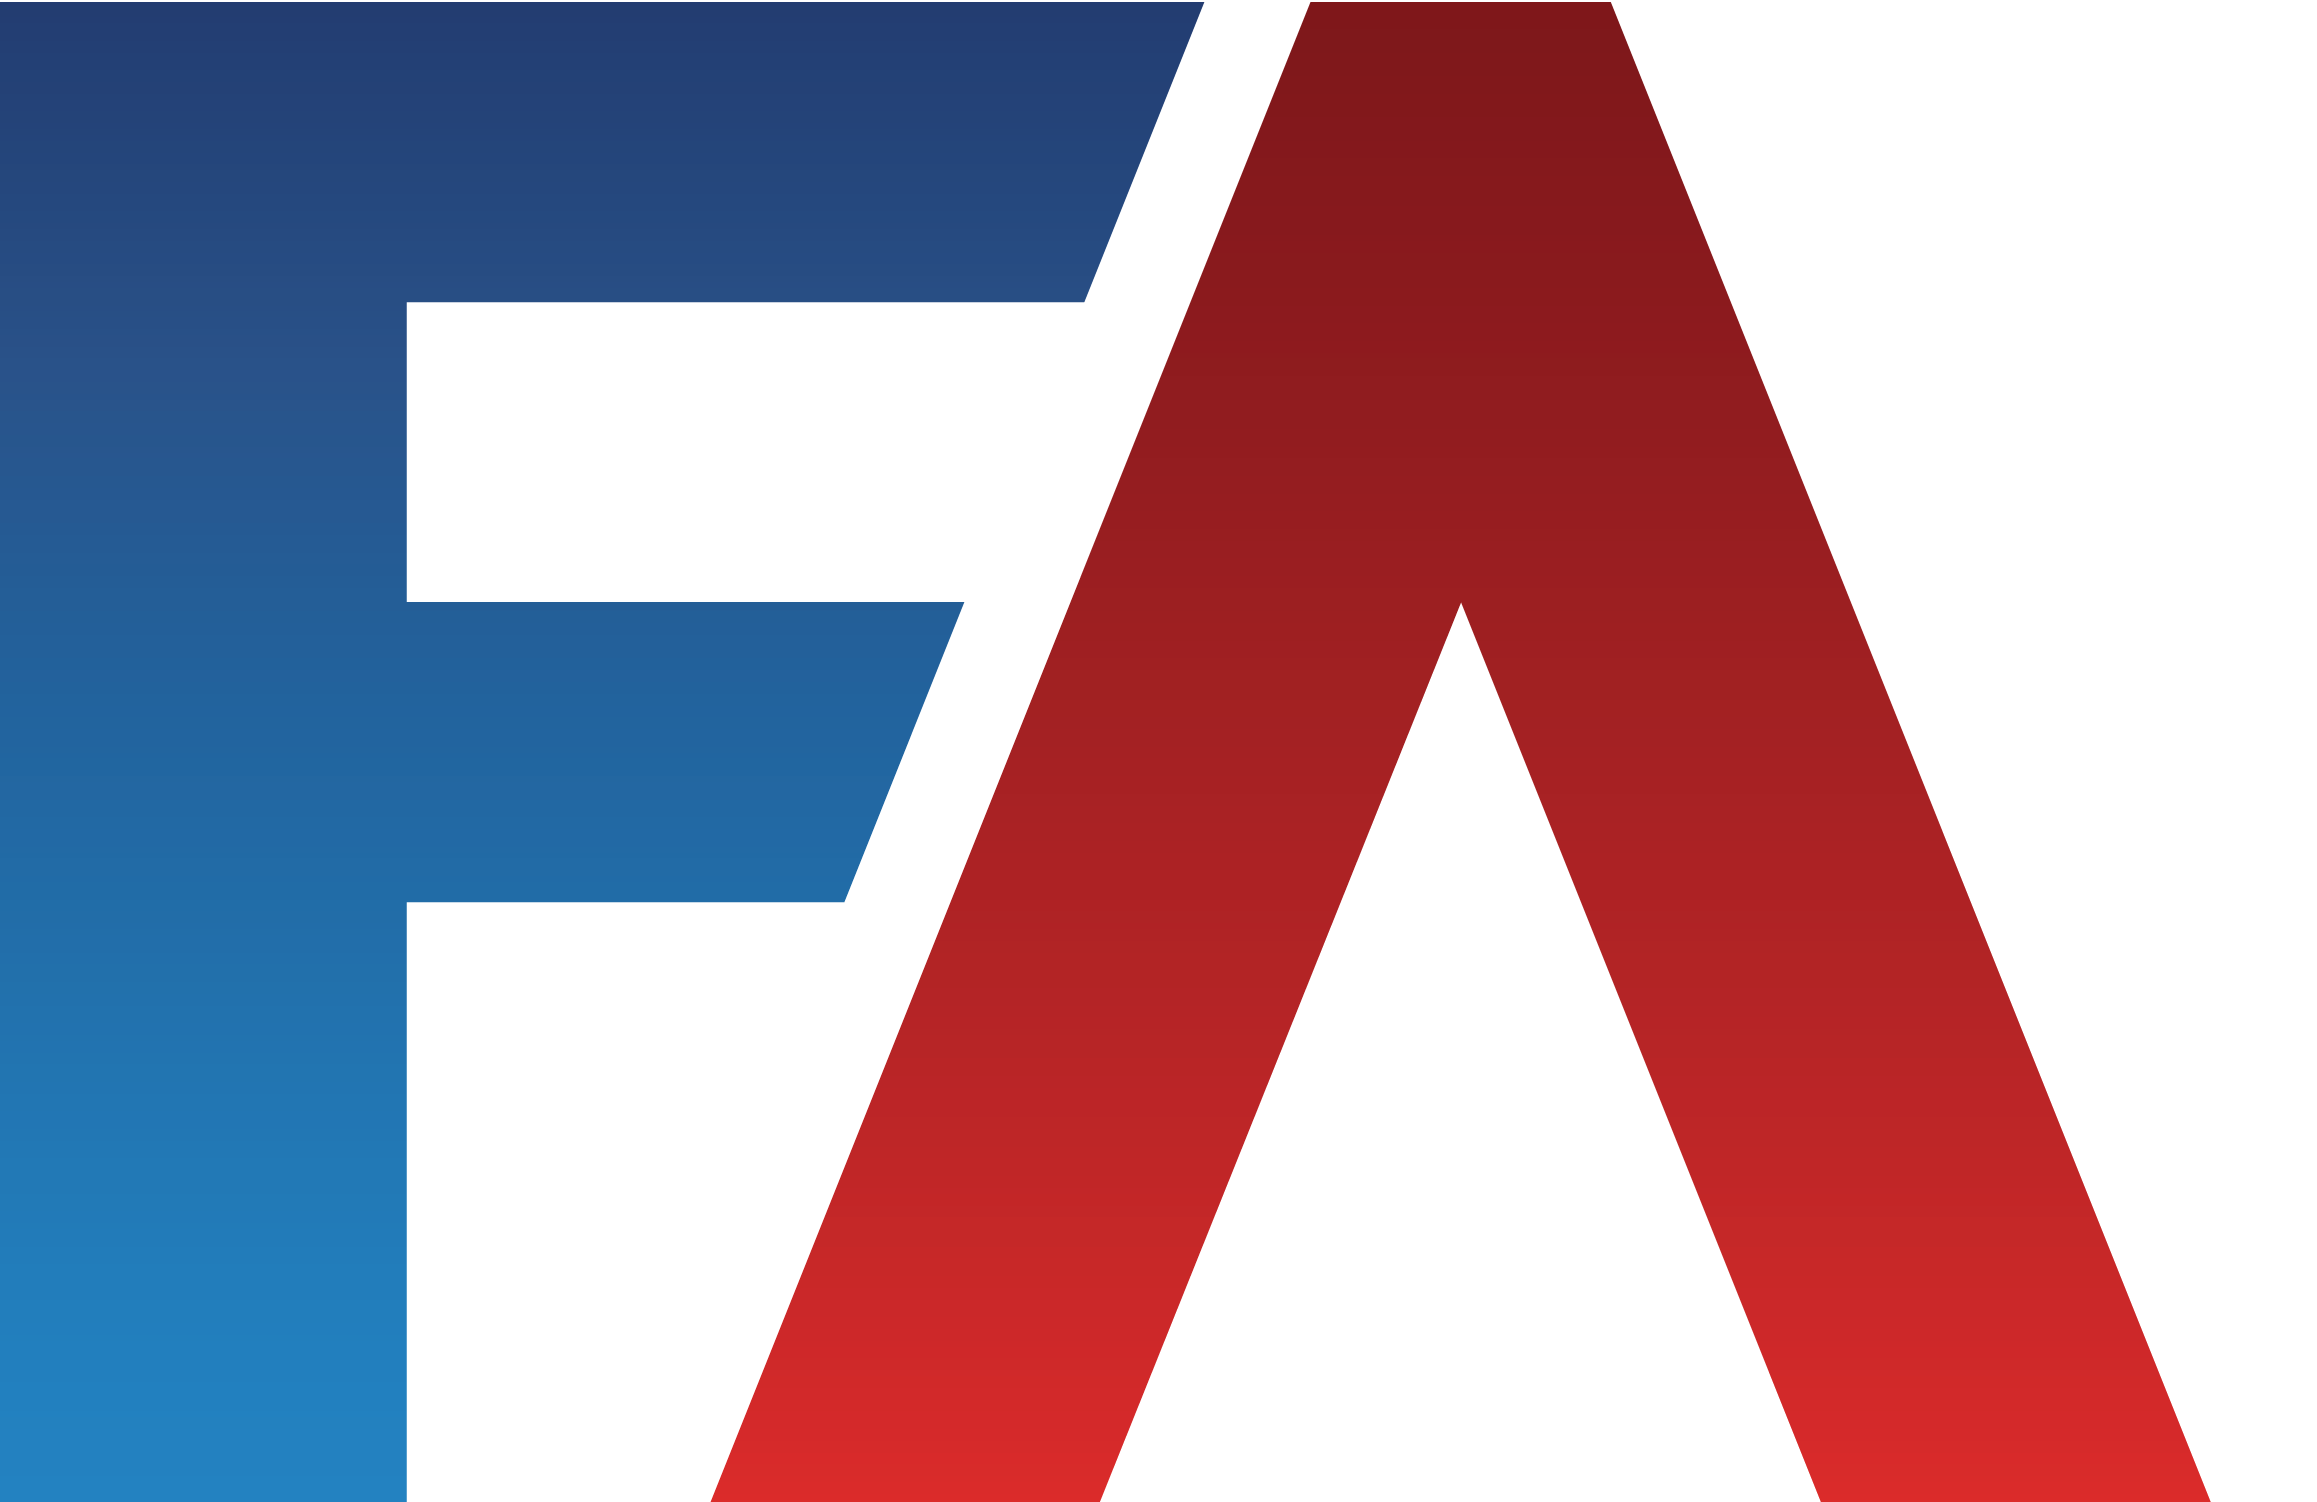 Fantasy Sports Business: Positive News Not Media Hype | FantasyAlarm.com